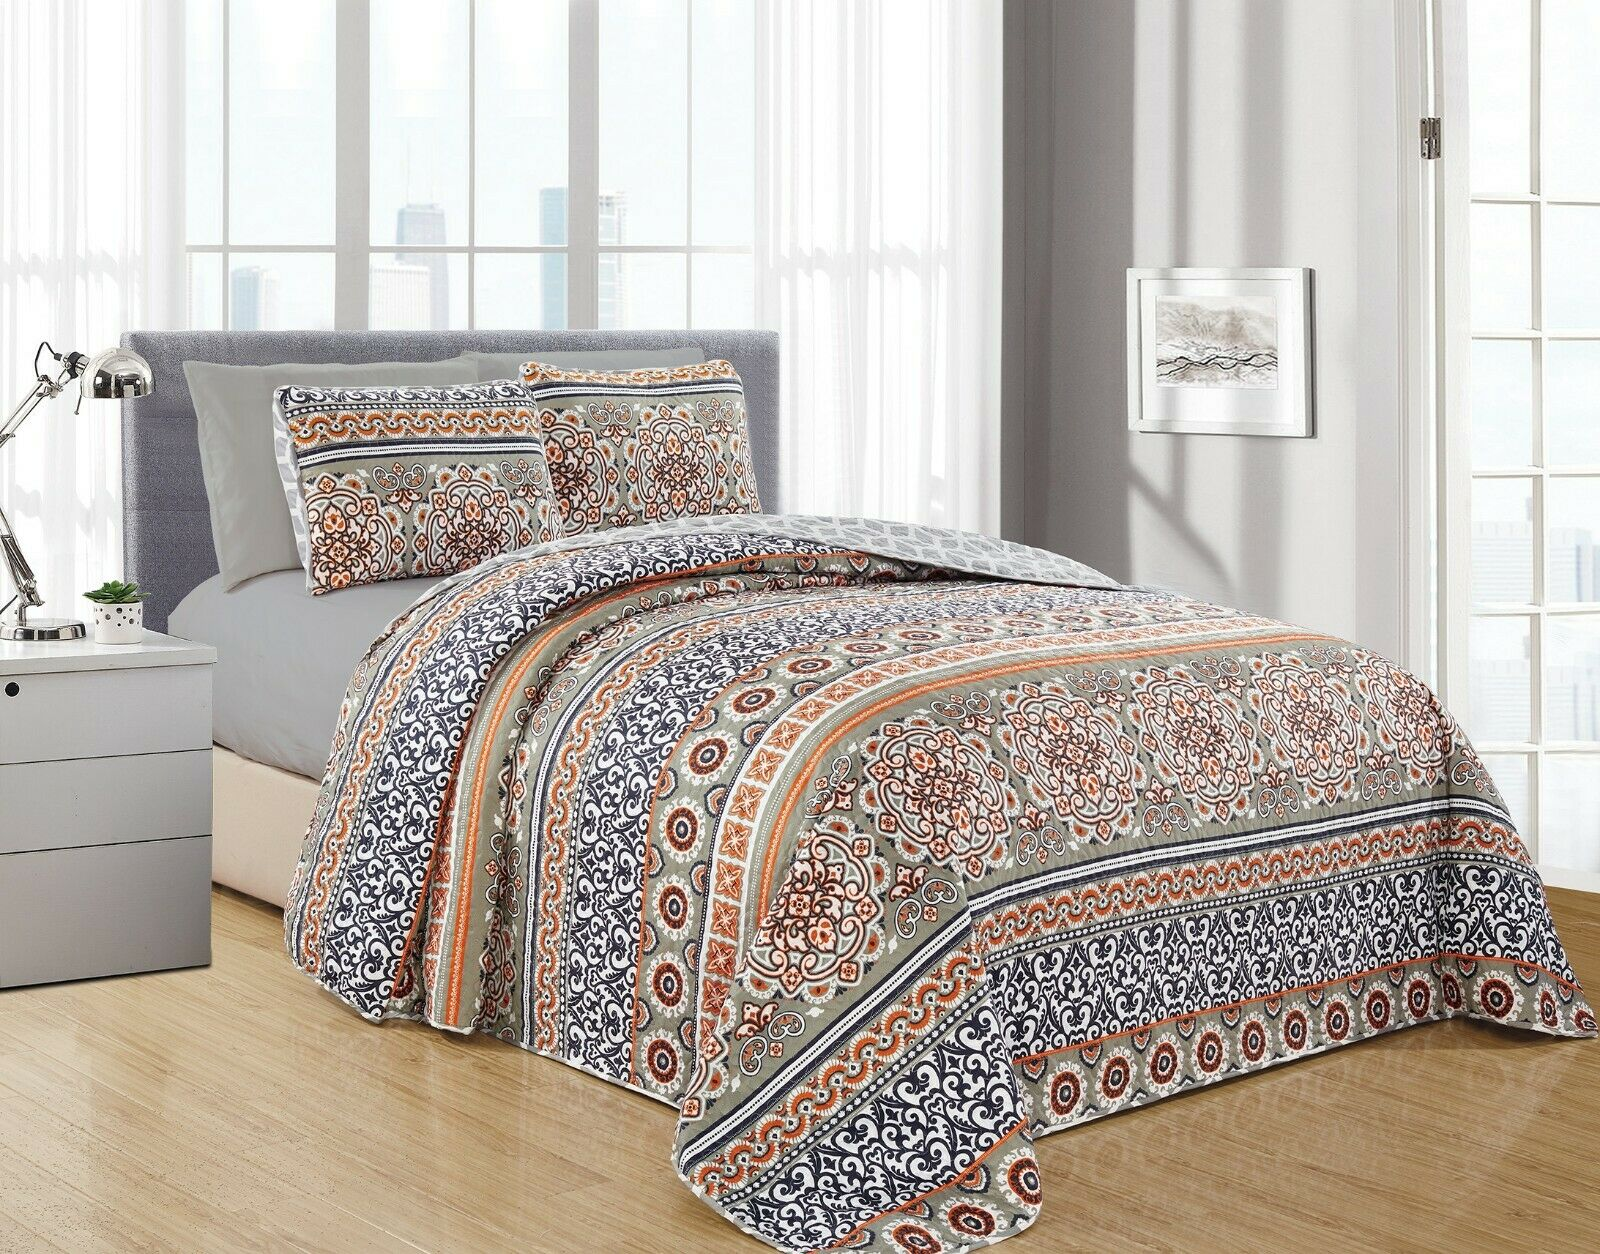 SARA 6PC Printed Reversible Bedspread, Oversize Coverlet